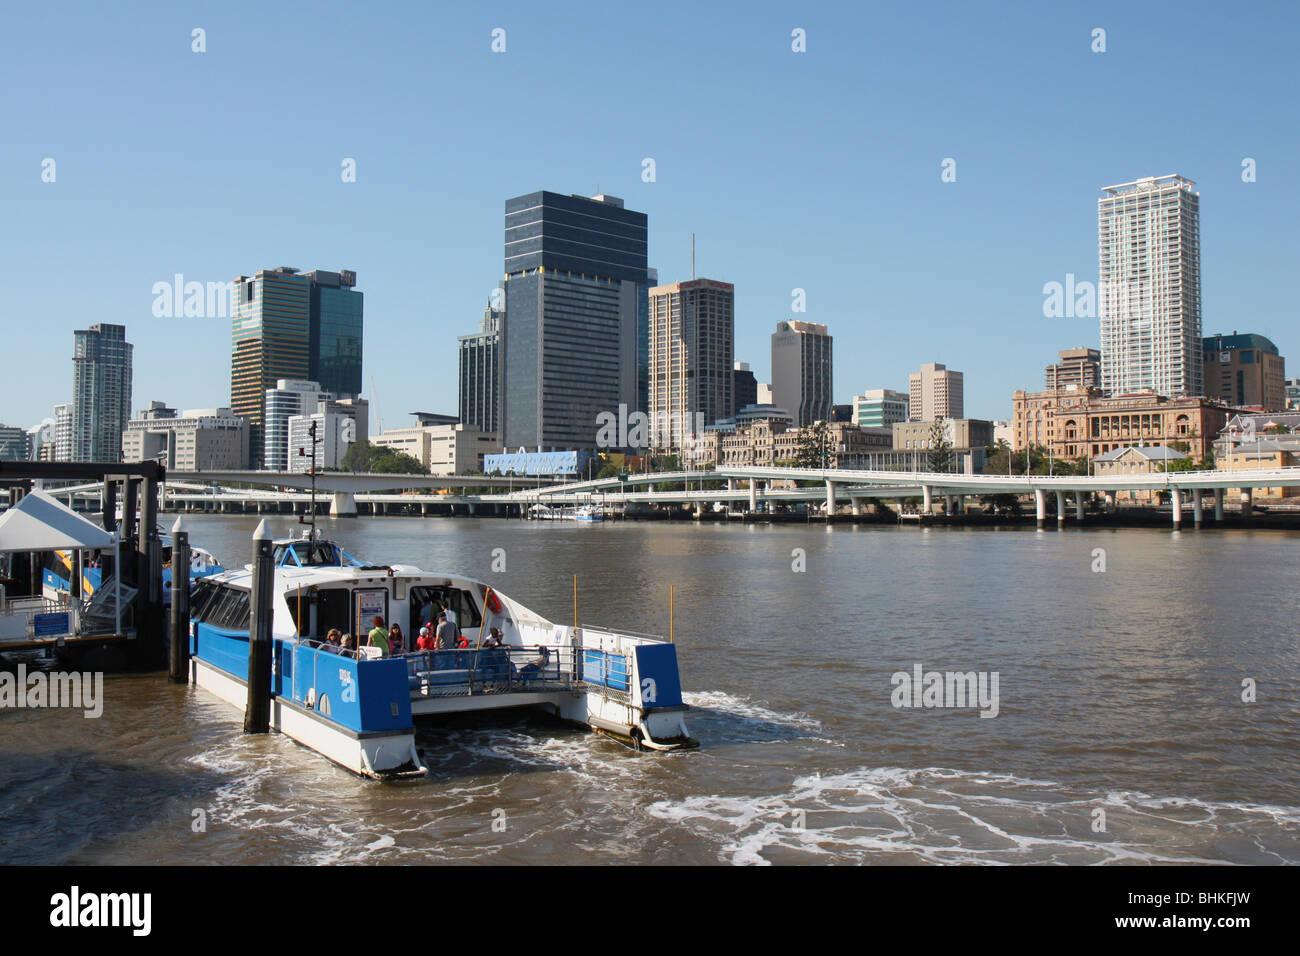 Purchase date in Brisbane